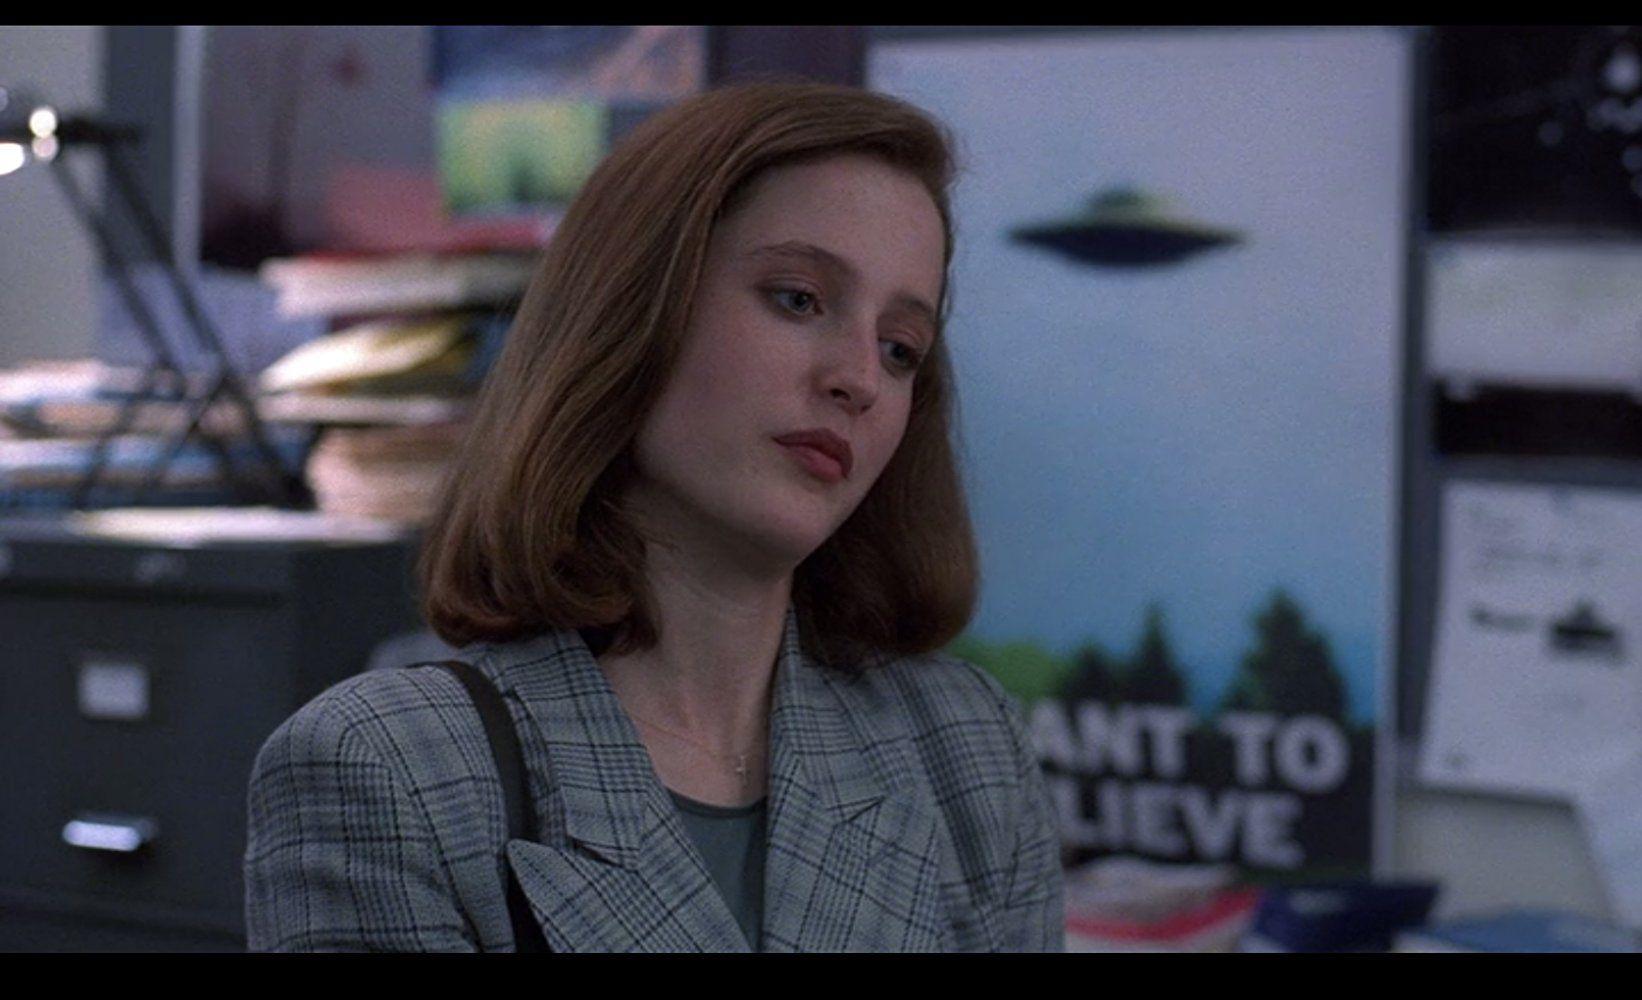 The X Files Pilot Tv Episode 1993 On Imdb Movies Tv Celebs And More X Files Tv Episodes Pilot